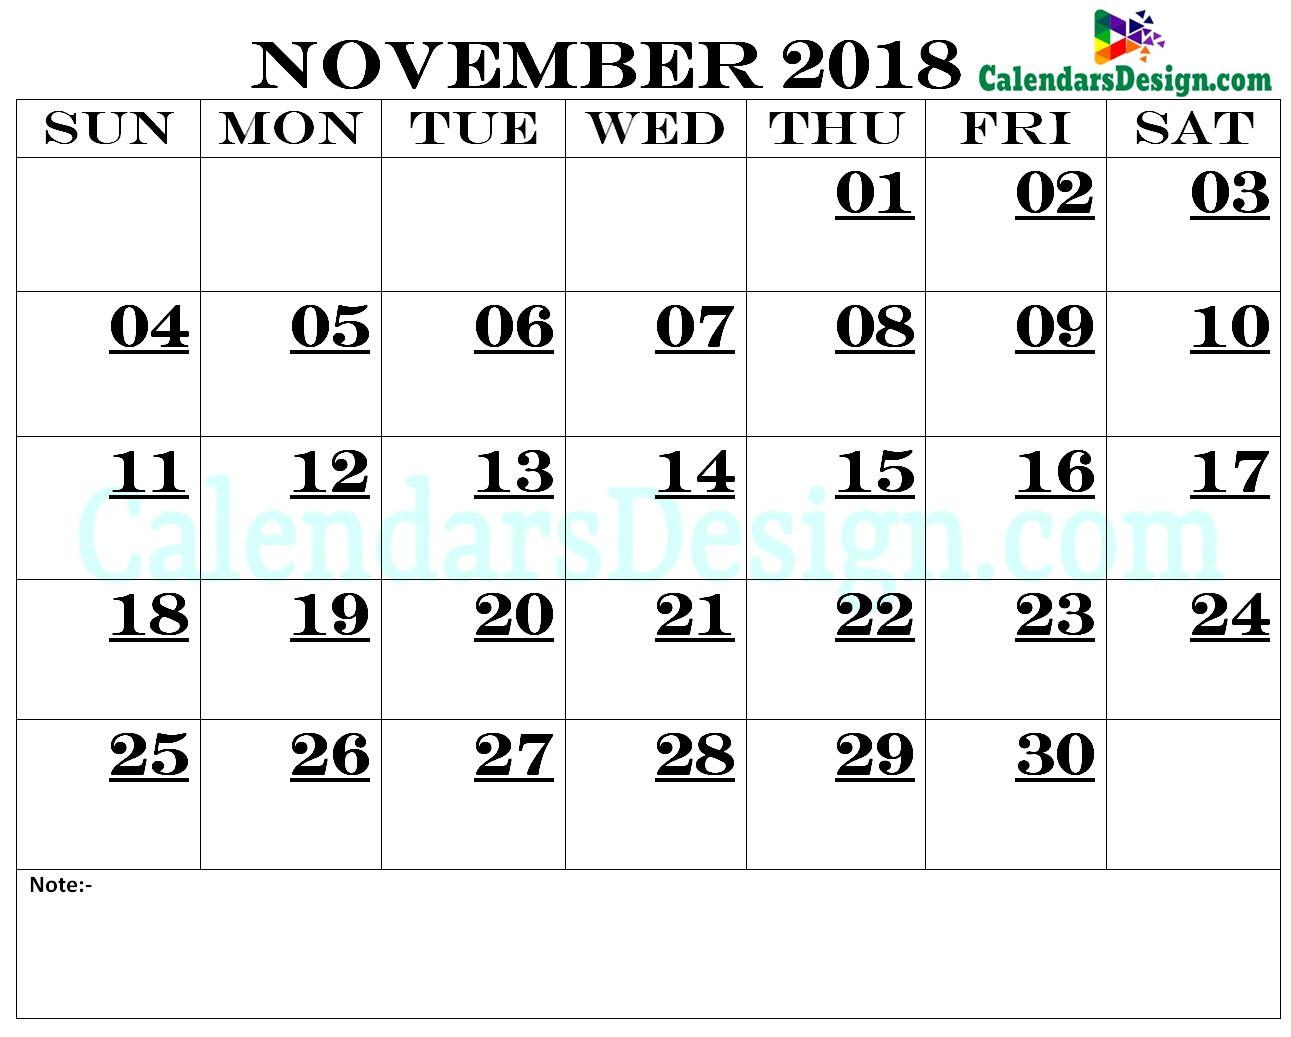 November Calendar 2018 Printable